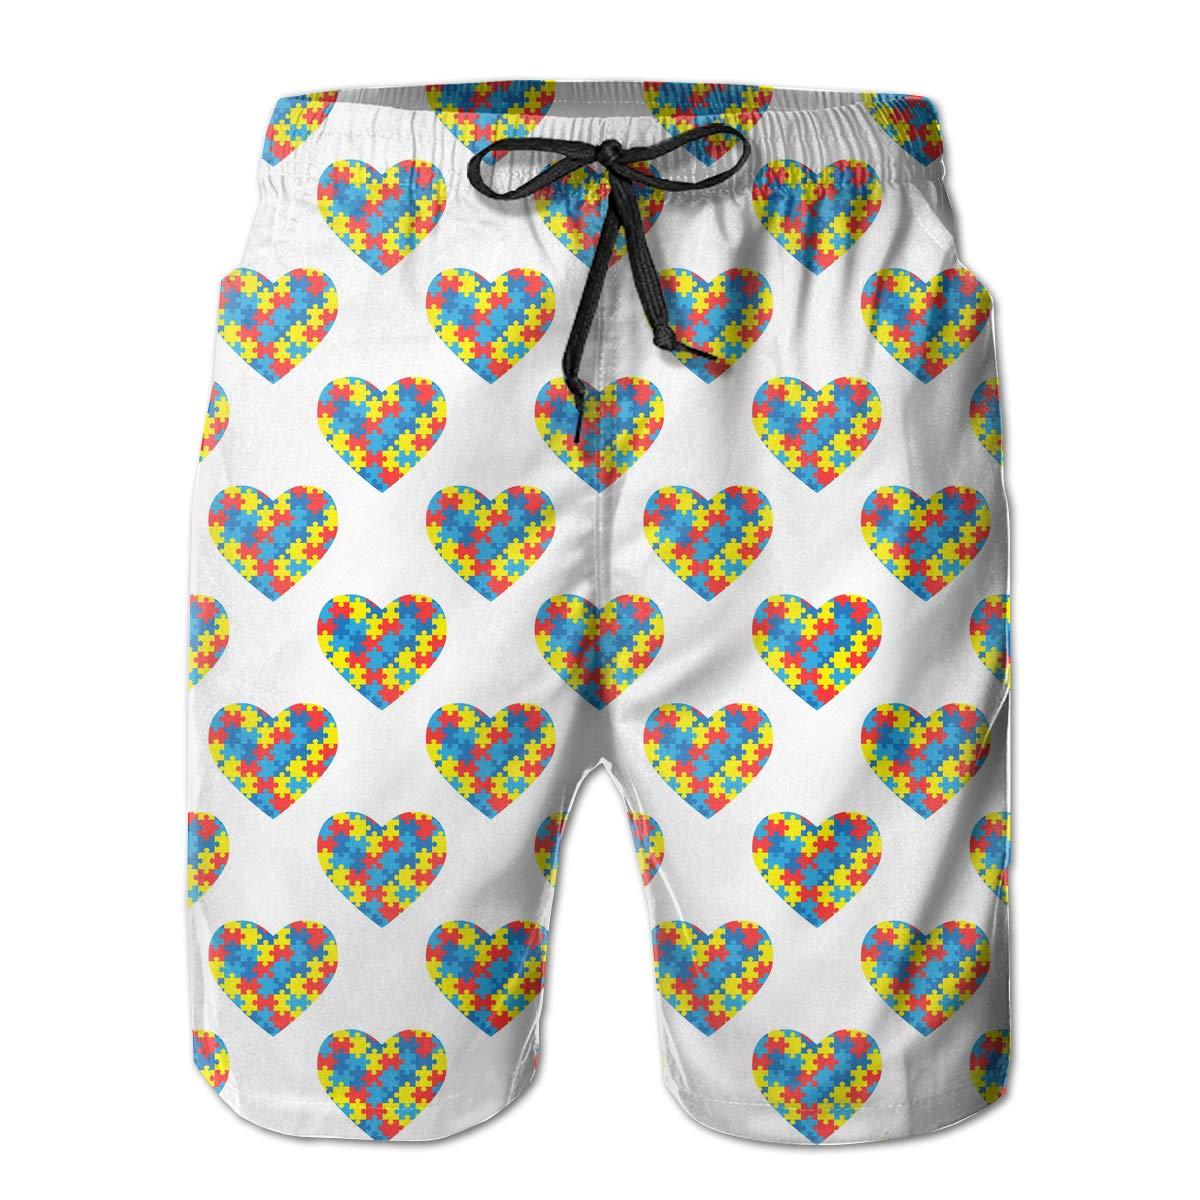 Polyester World Autism Awareness Day Pattern Beachwear with Pockets Xk7@KU Mens Casual Swim Trunks